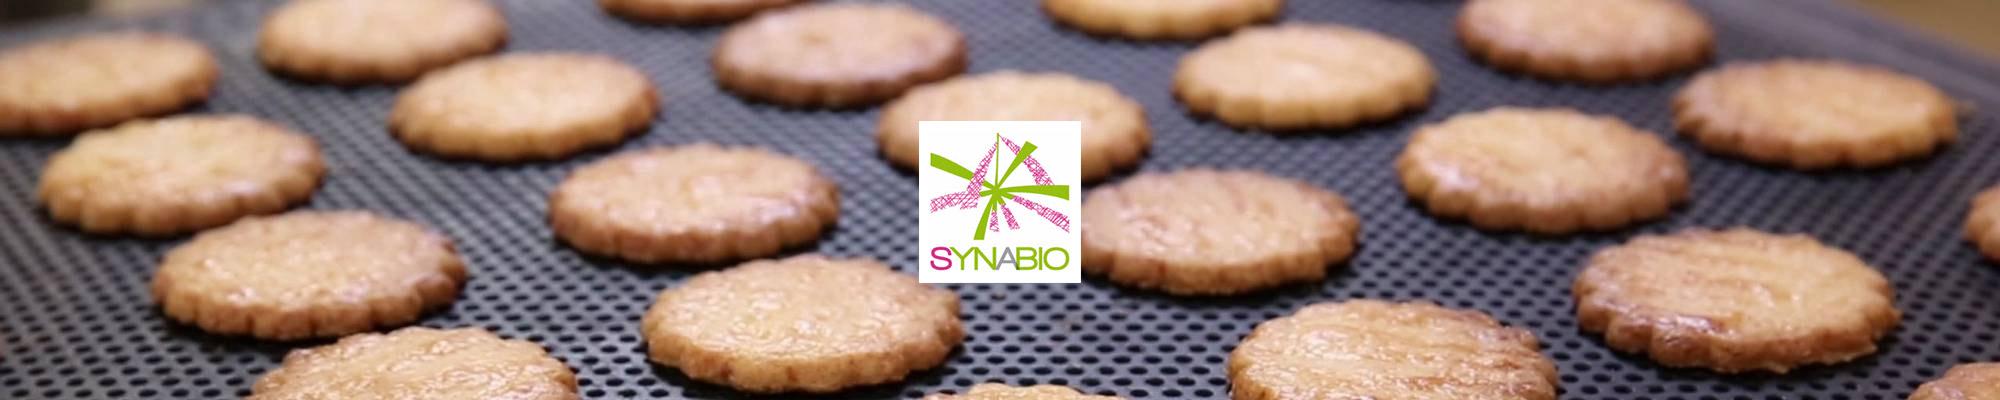 SYNABIO (syndicat national des entreprises bio)